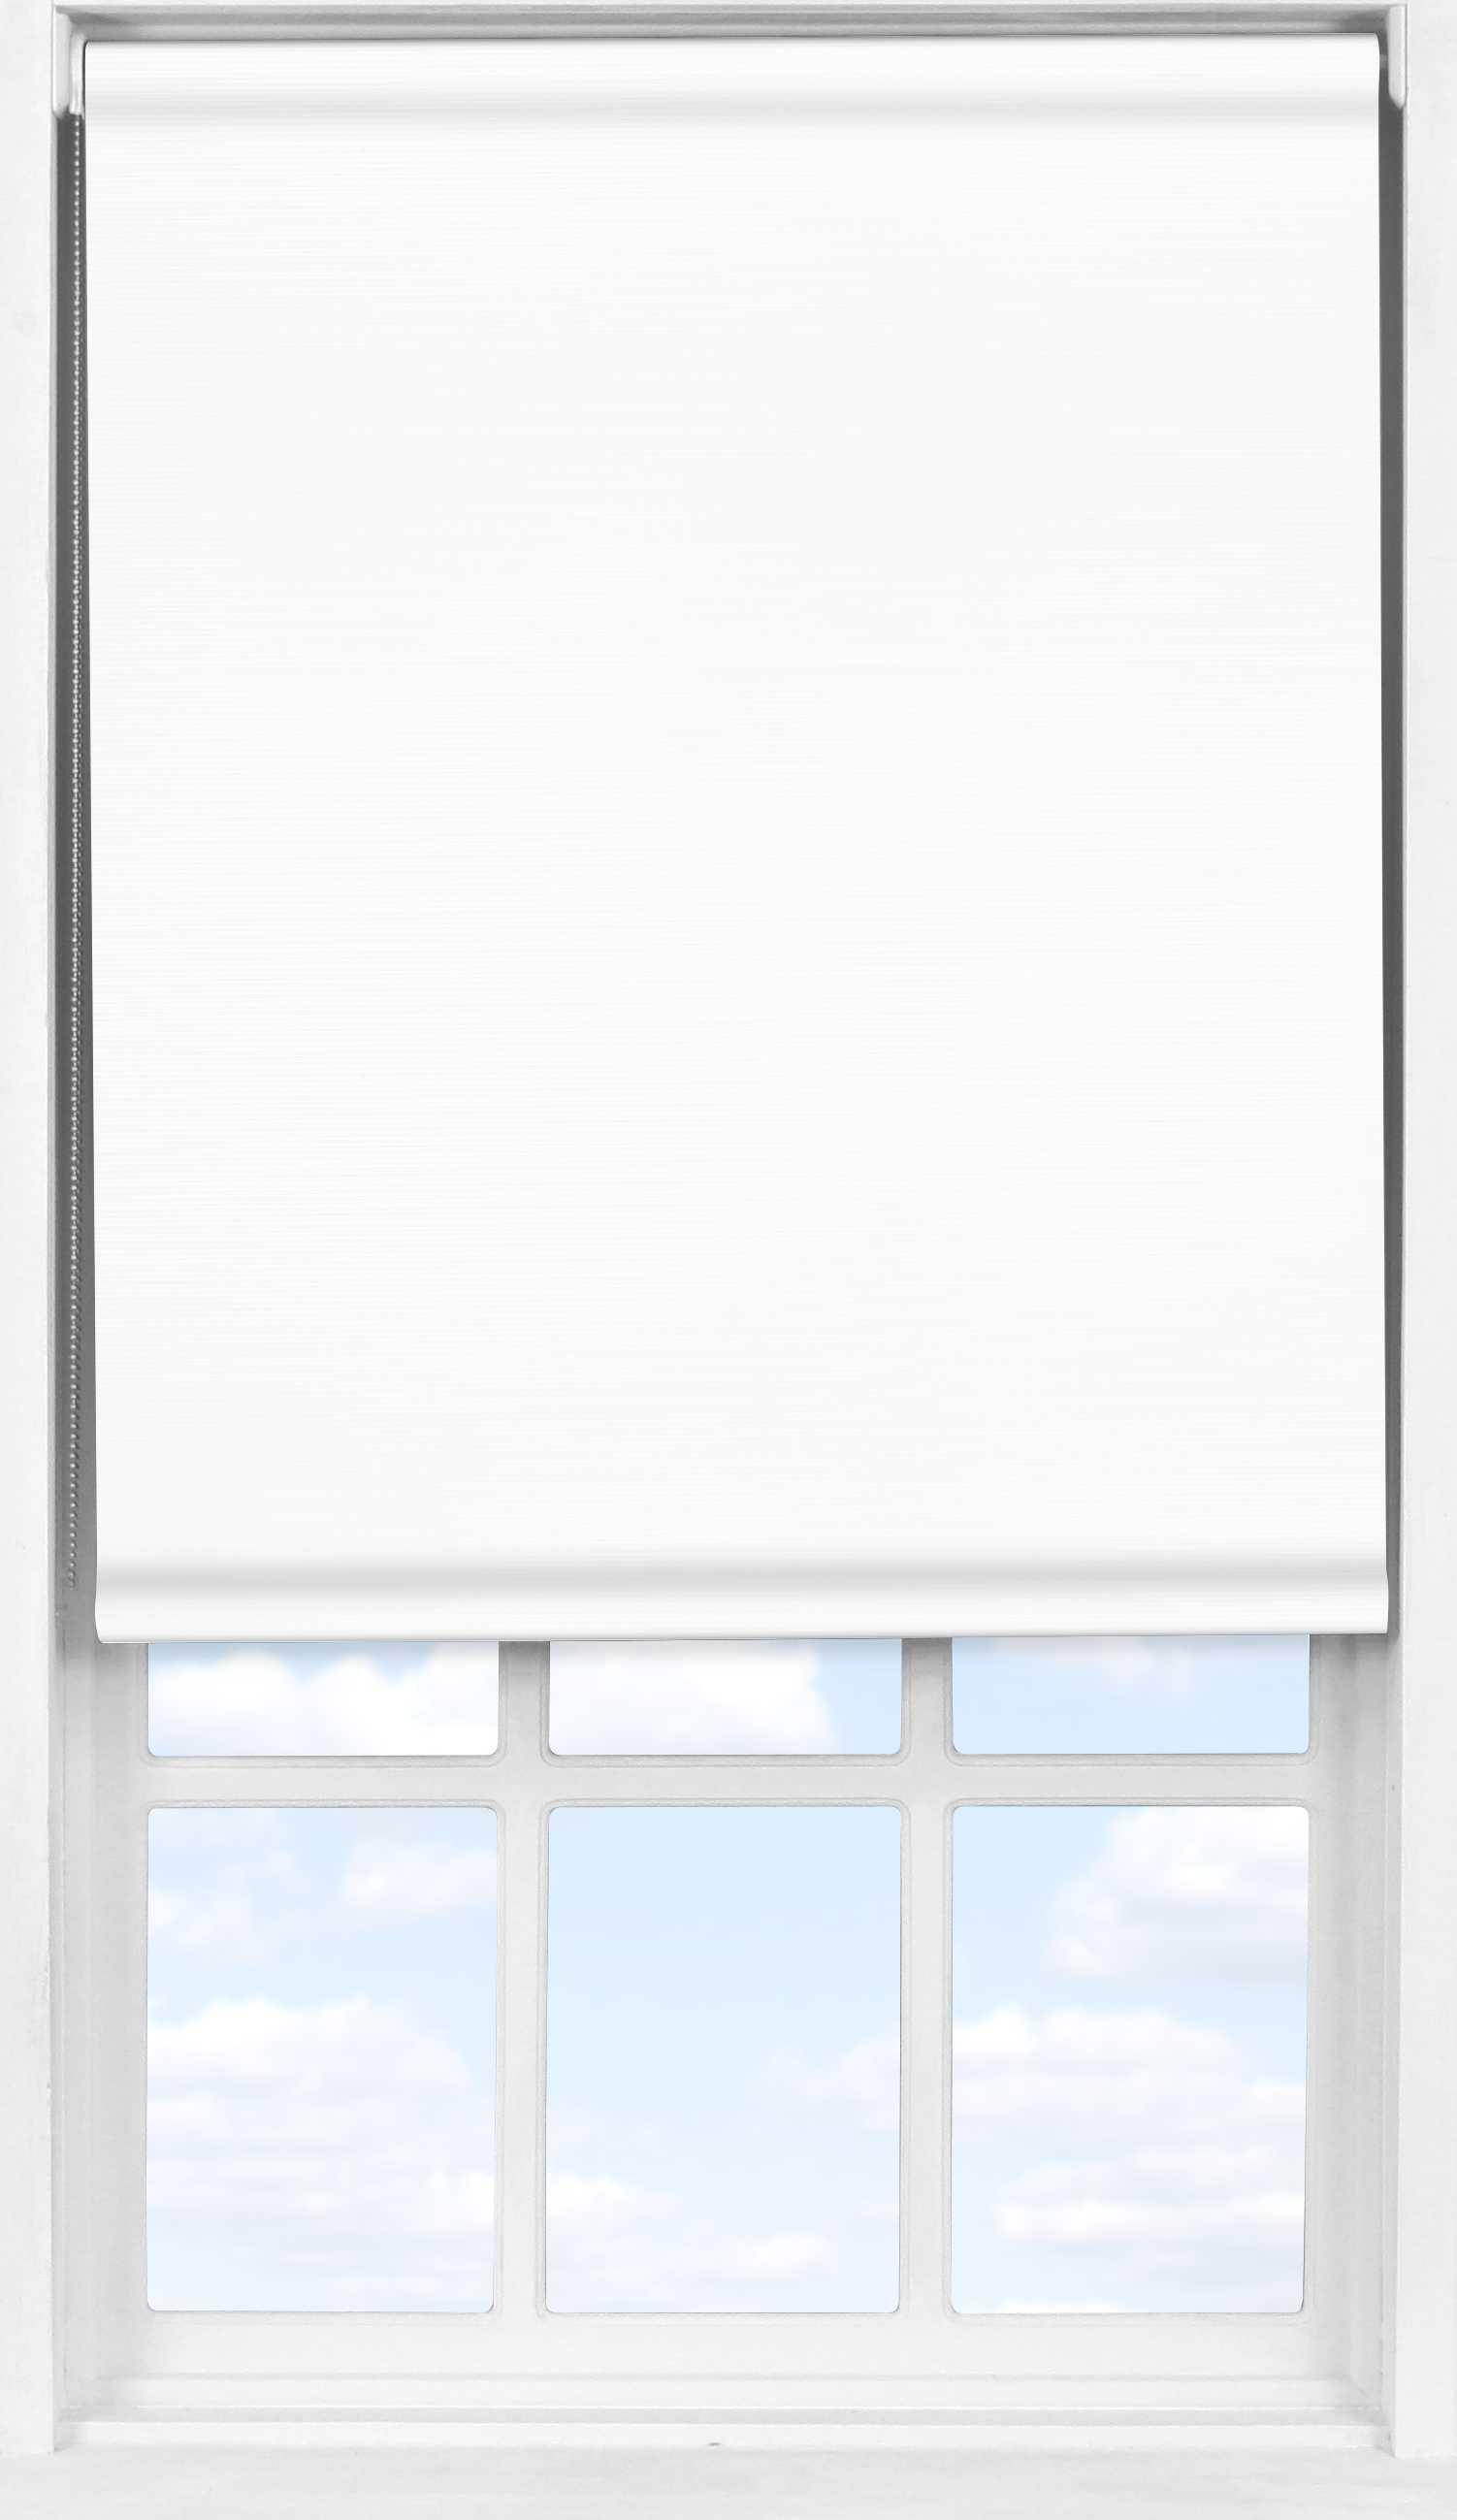 Easifit Roller Blind in Soft White Transparent